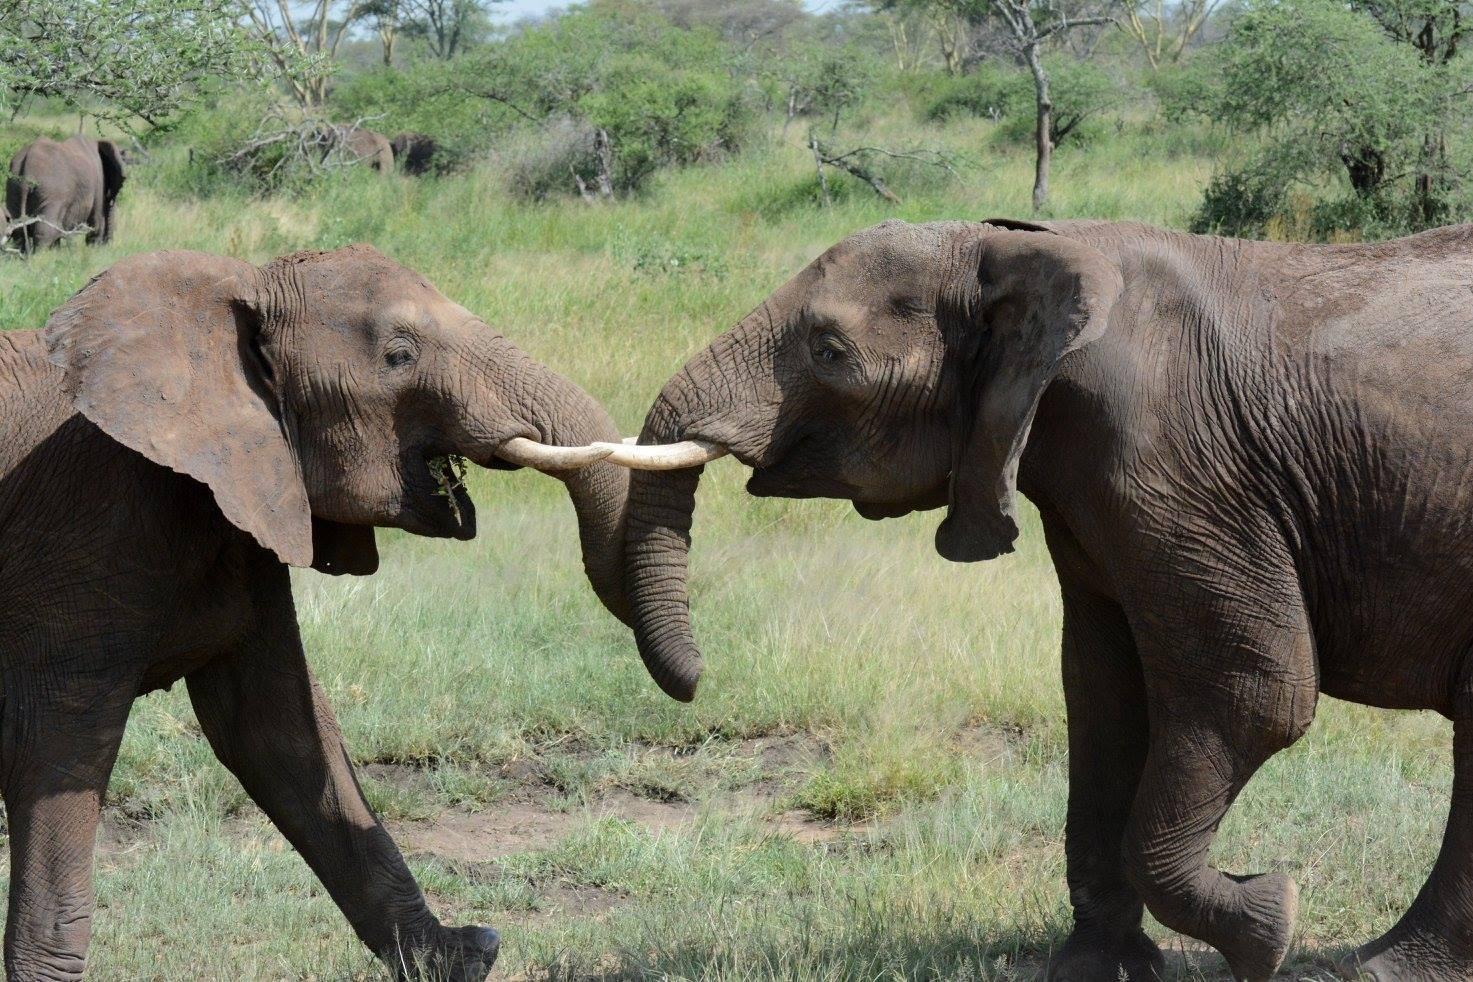 Tanzania is a hotspot of elephant poaching. Photo by Udayan Dasgupta.